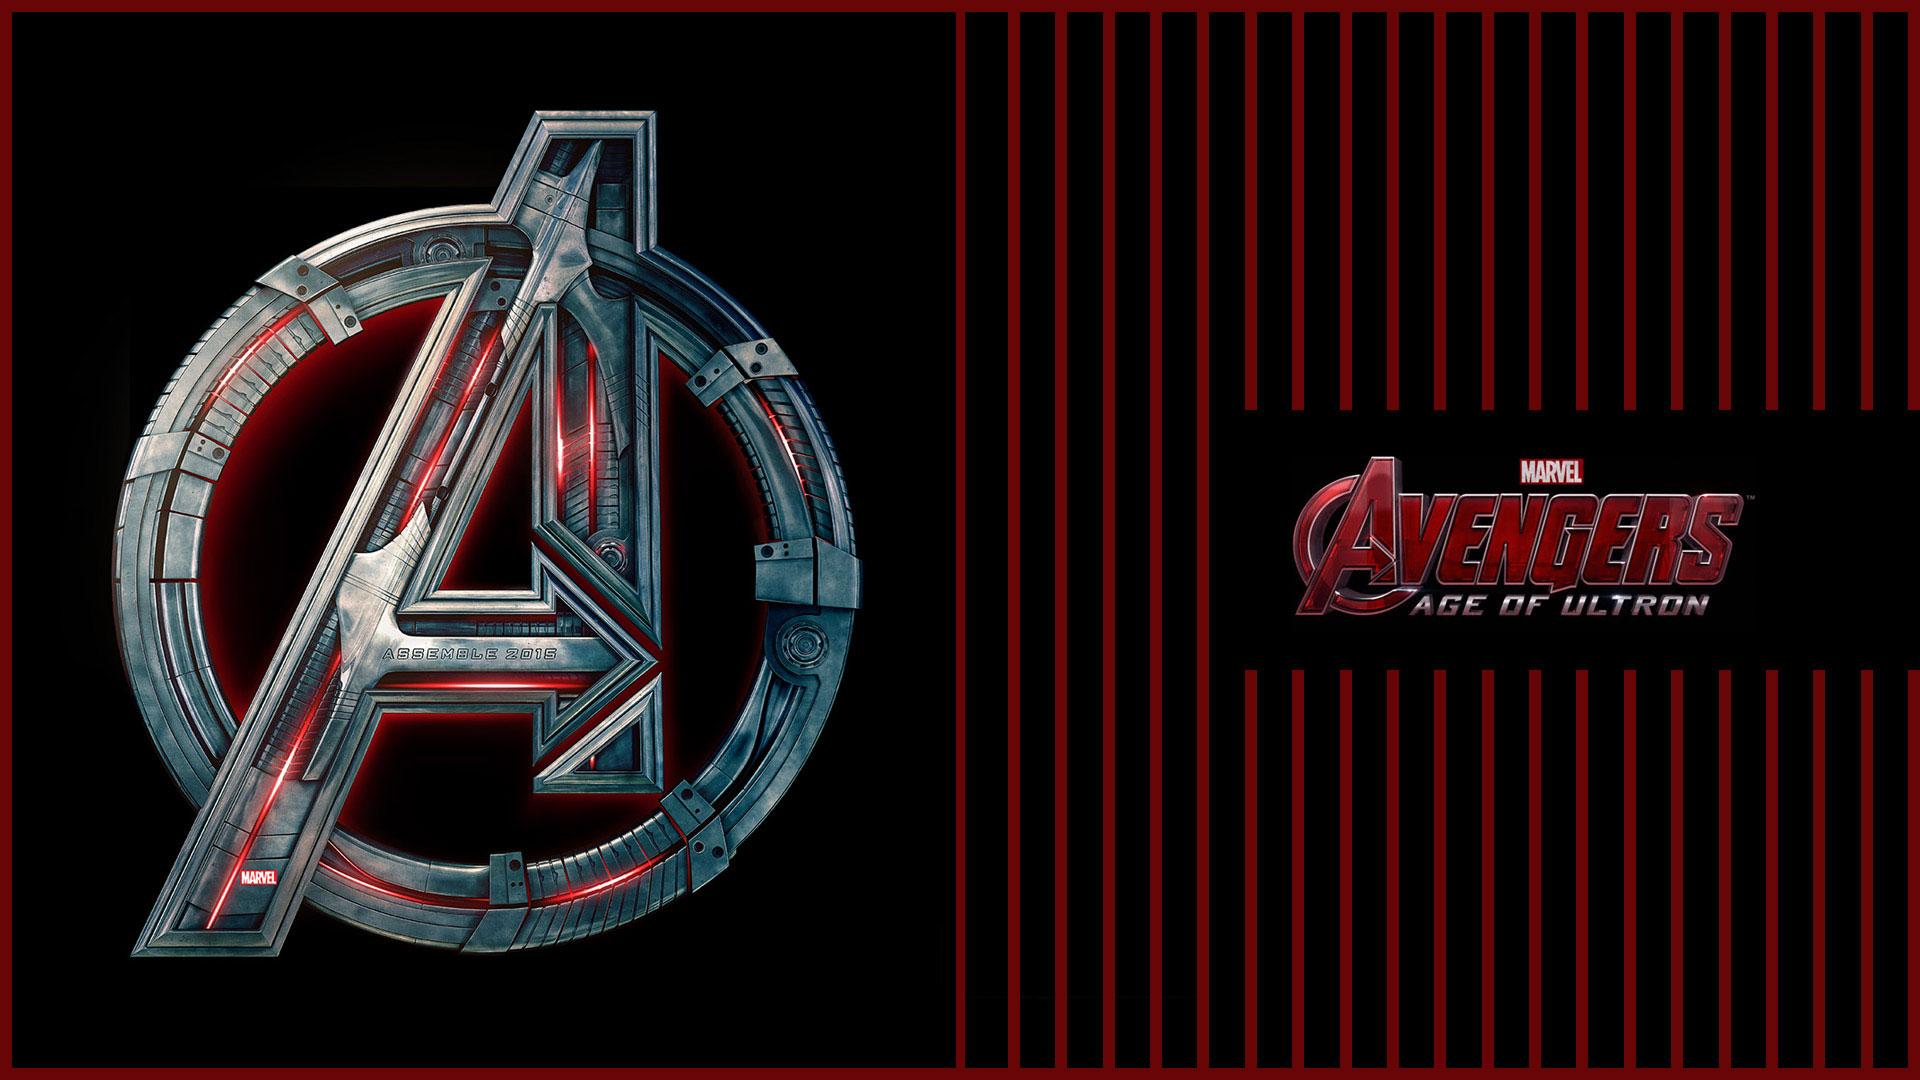 avengers 2 age of ultron logo wallpaper hd